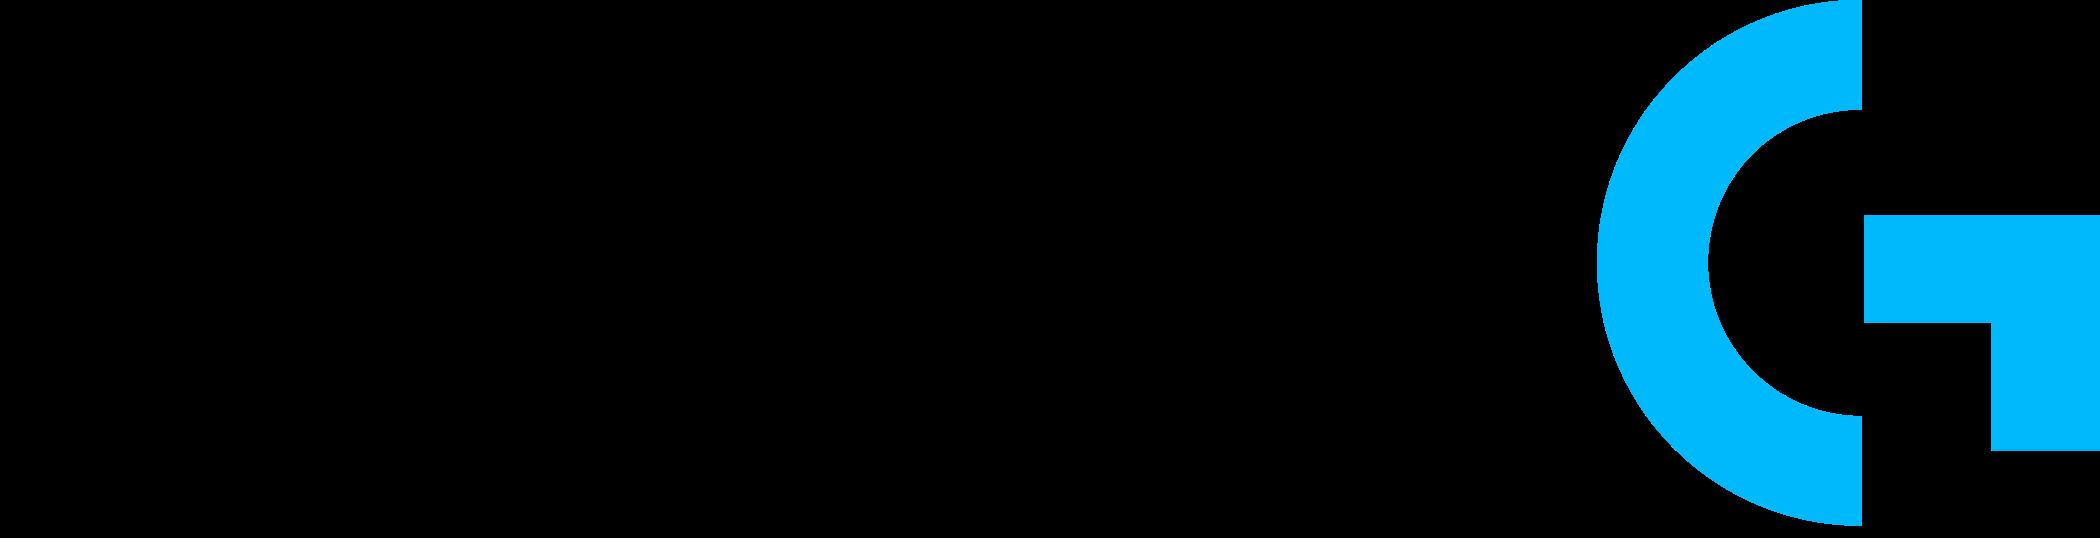 logitech logo 3 - Logitech Logo